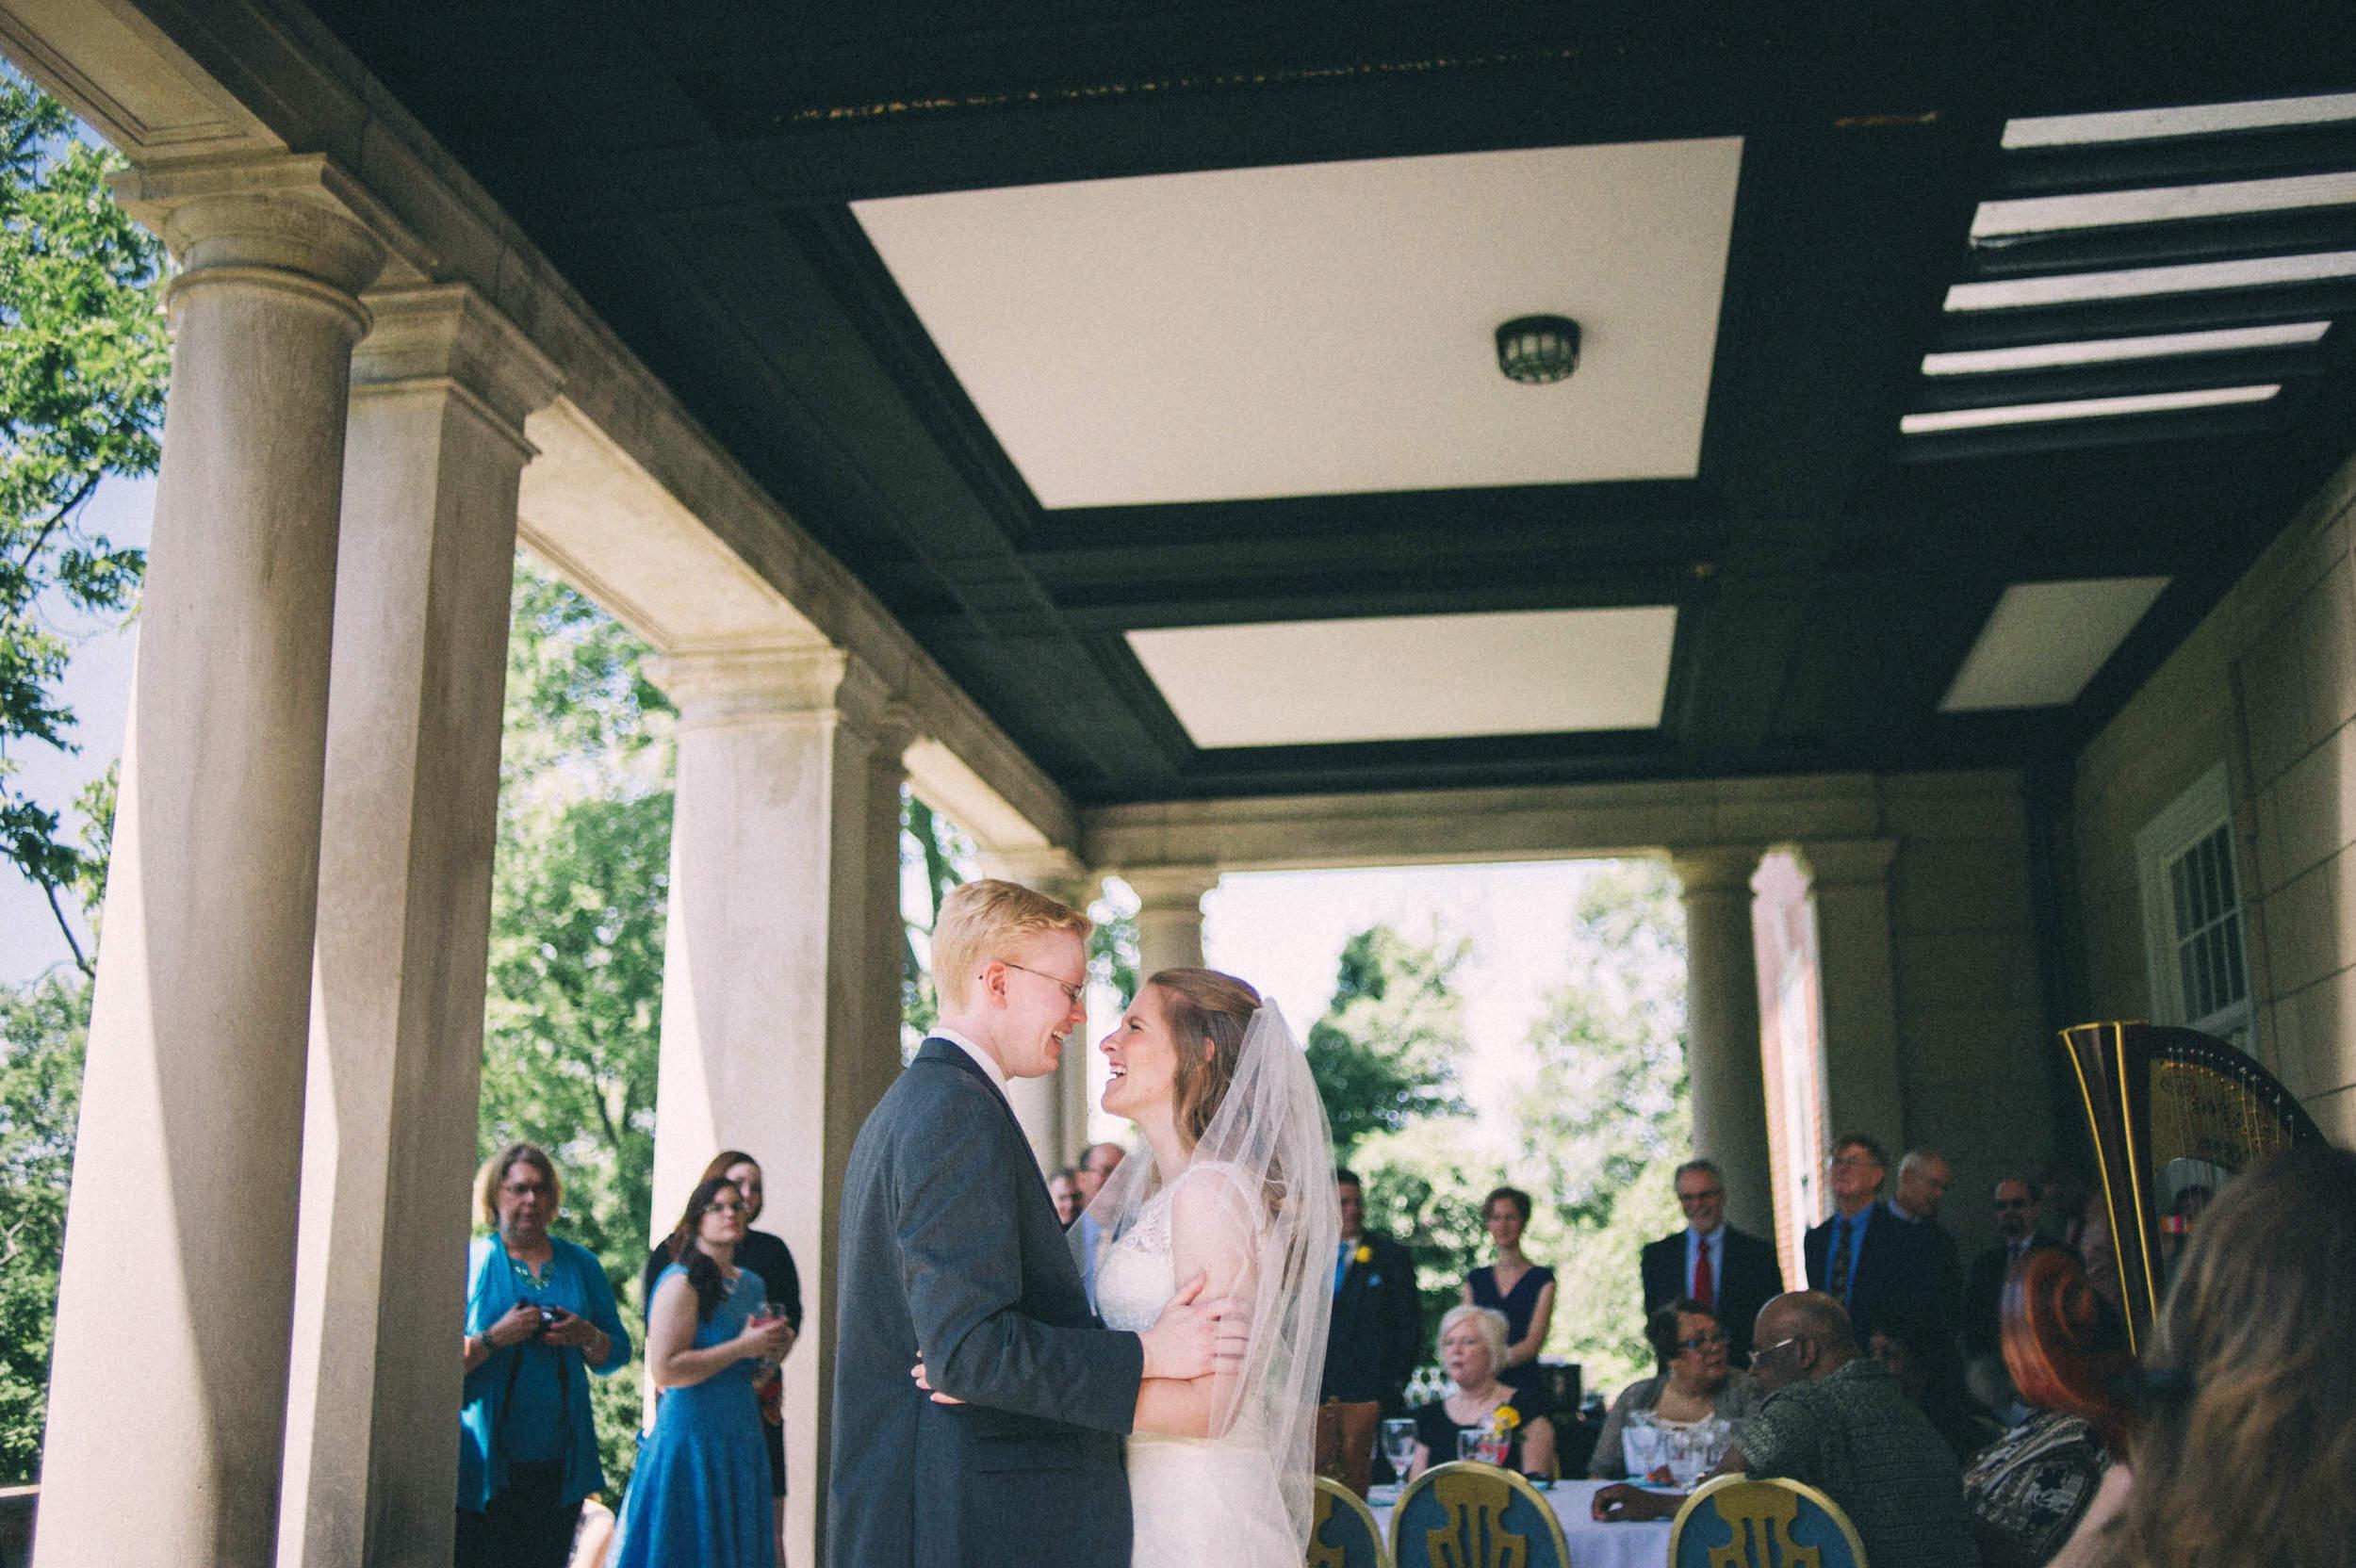 Jenna-Patrick-Garden-Court-Presbyterian-Seminary-Wedding-Louisville-Kentucky-Sarah-Katherine-Davis-Photography-64.jpg